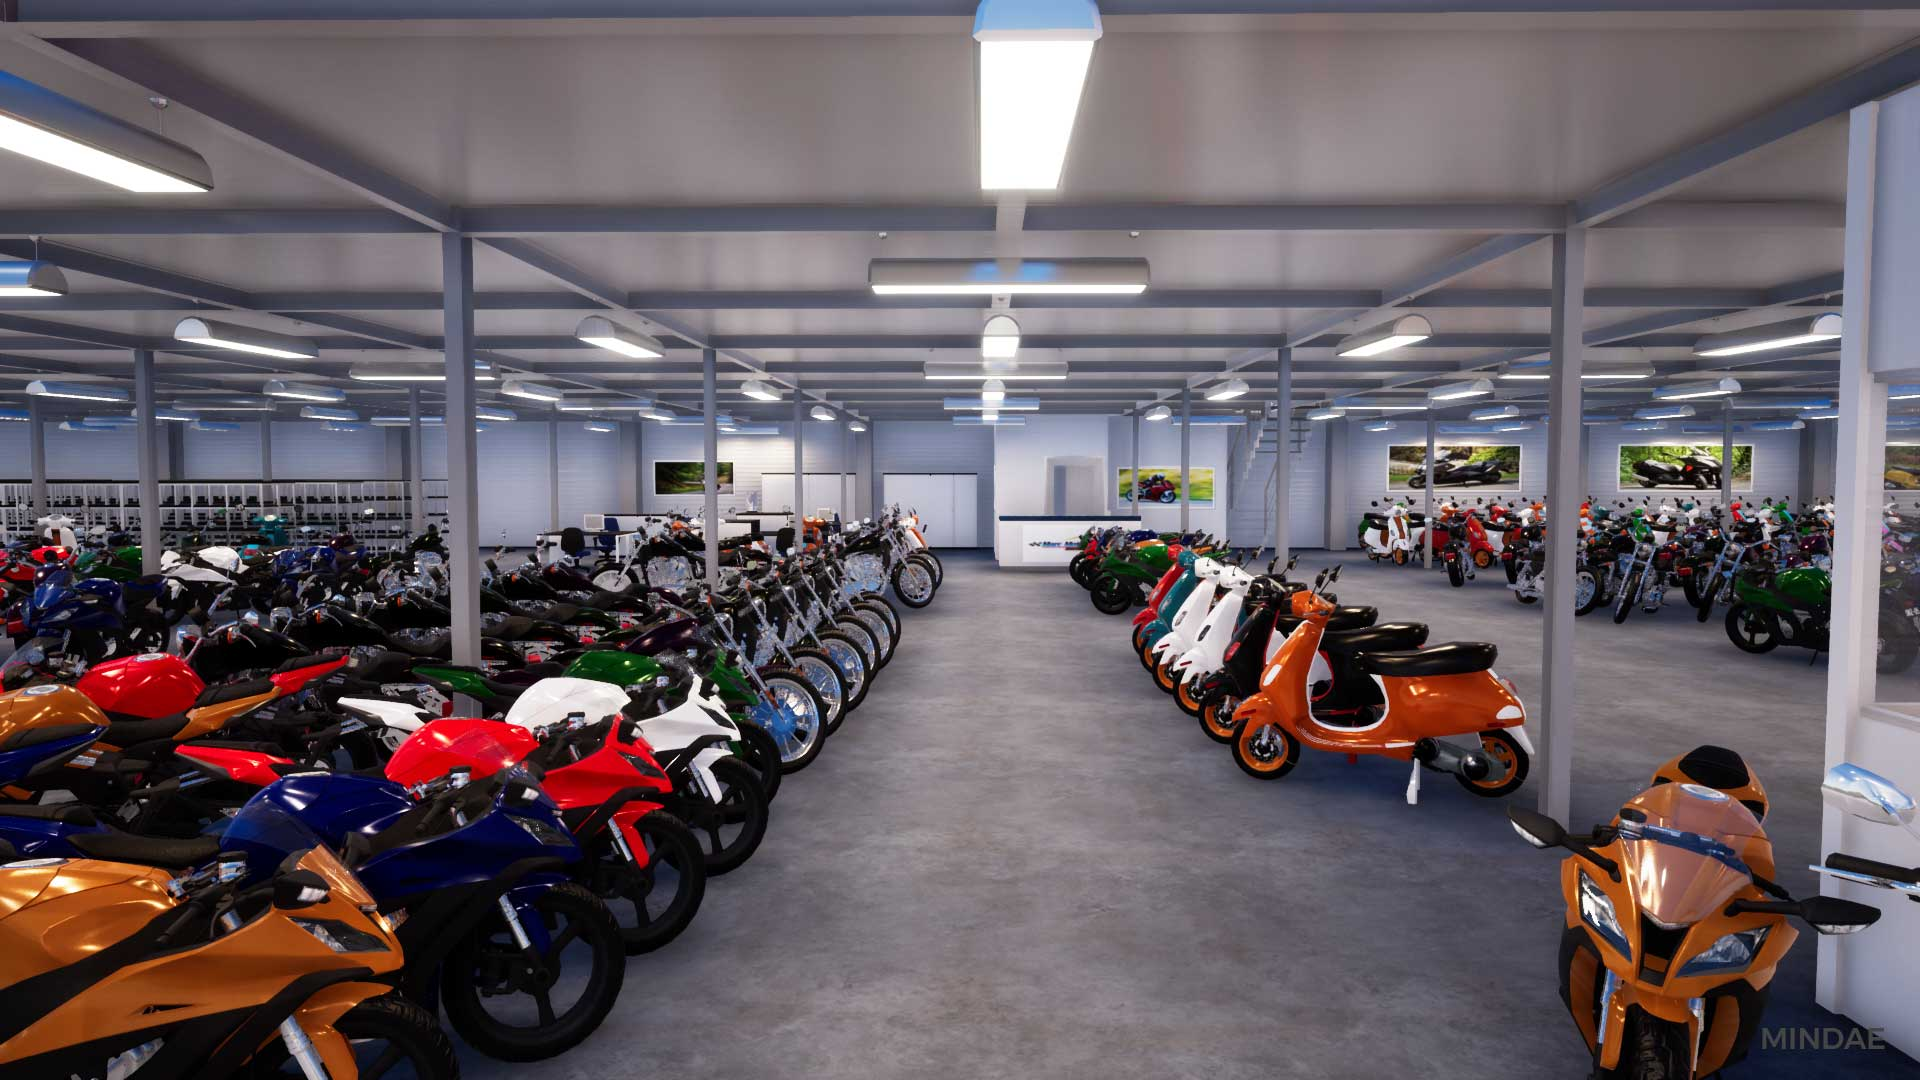 Mindae_3D_B-ingenierie_Industrie_moto_garage_Calvados-(9)